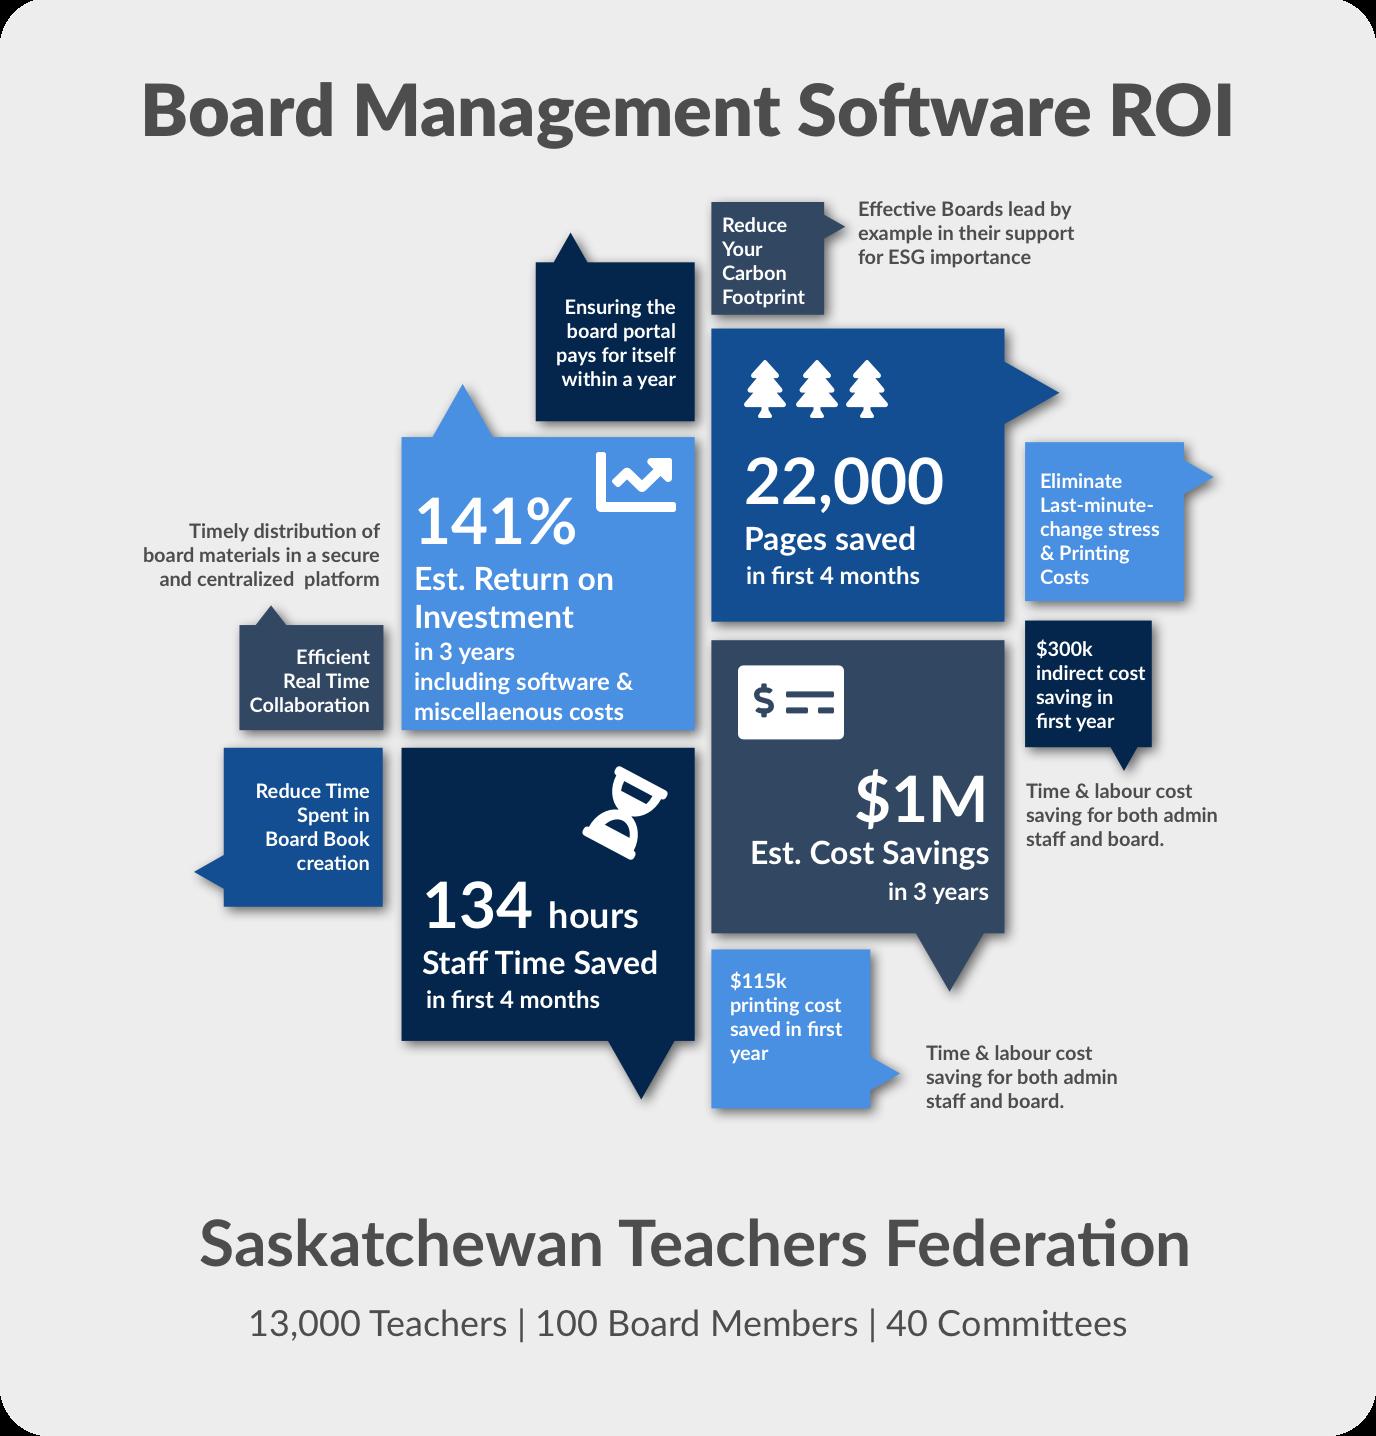 Saskatchewan Teachers Federation ROI